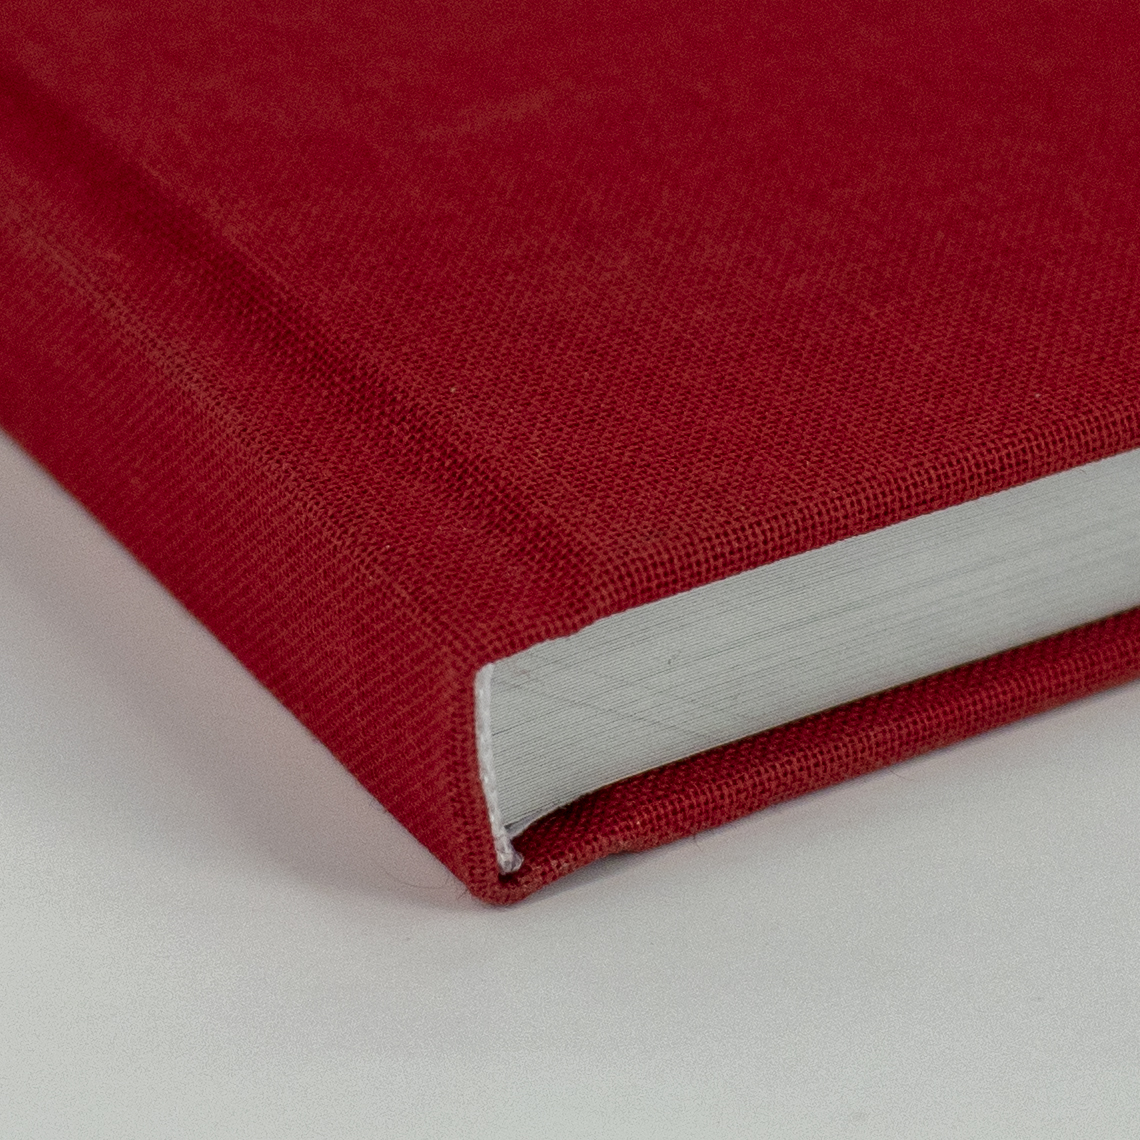 hardcover met linnen omslag